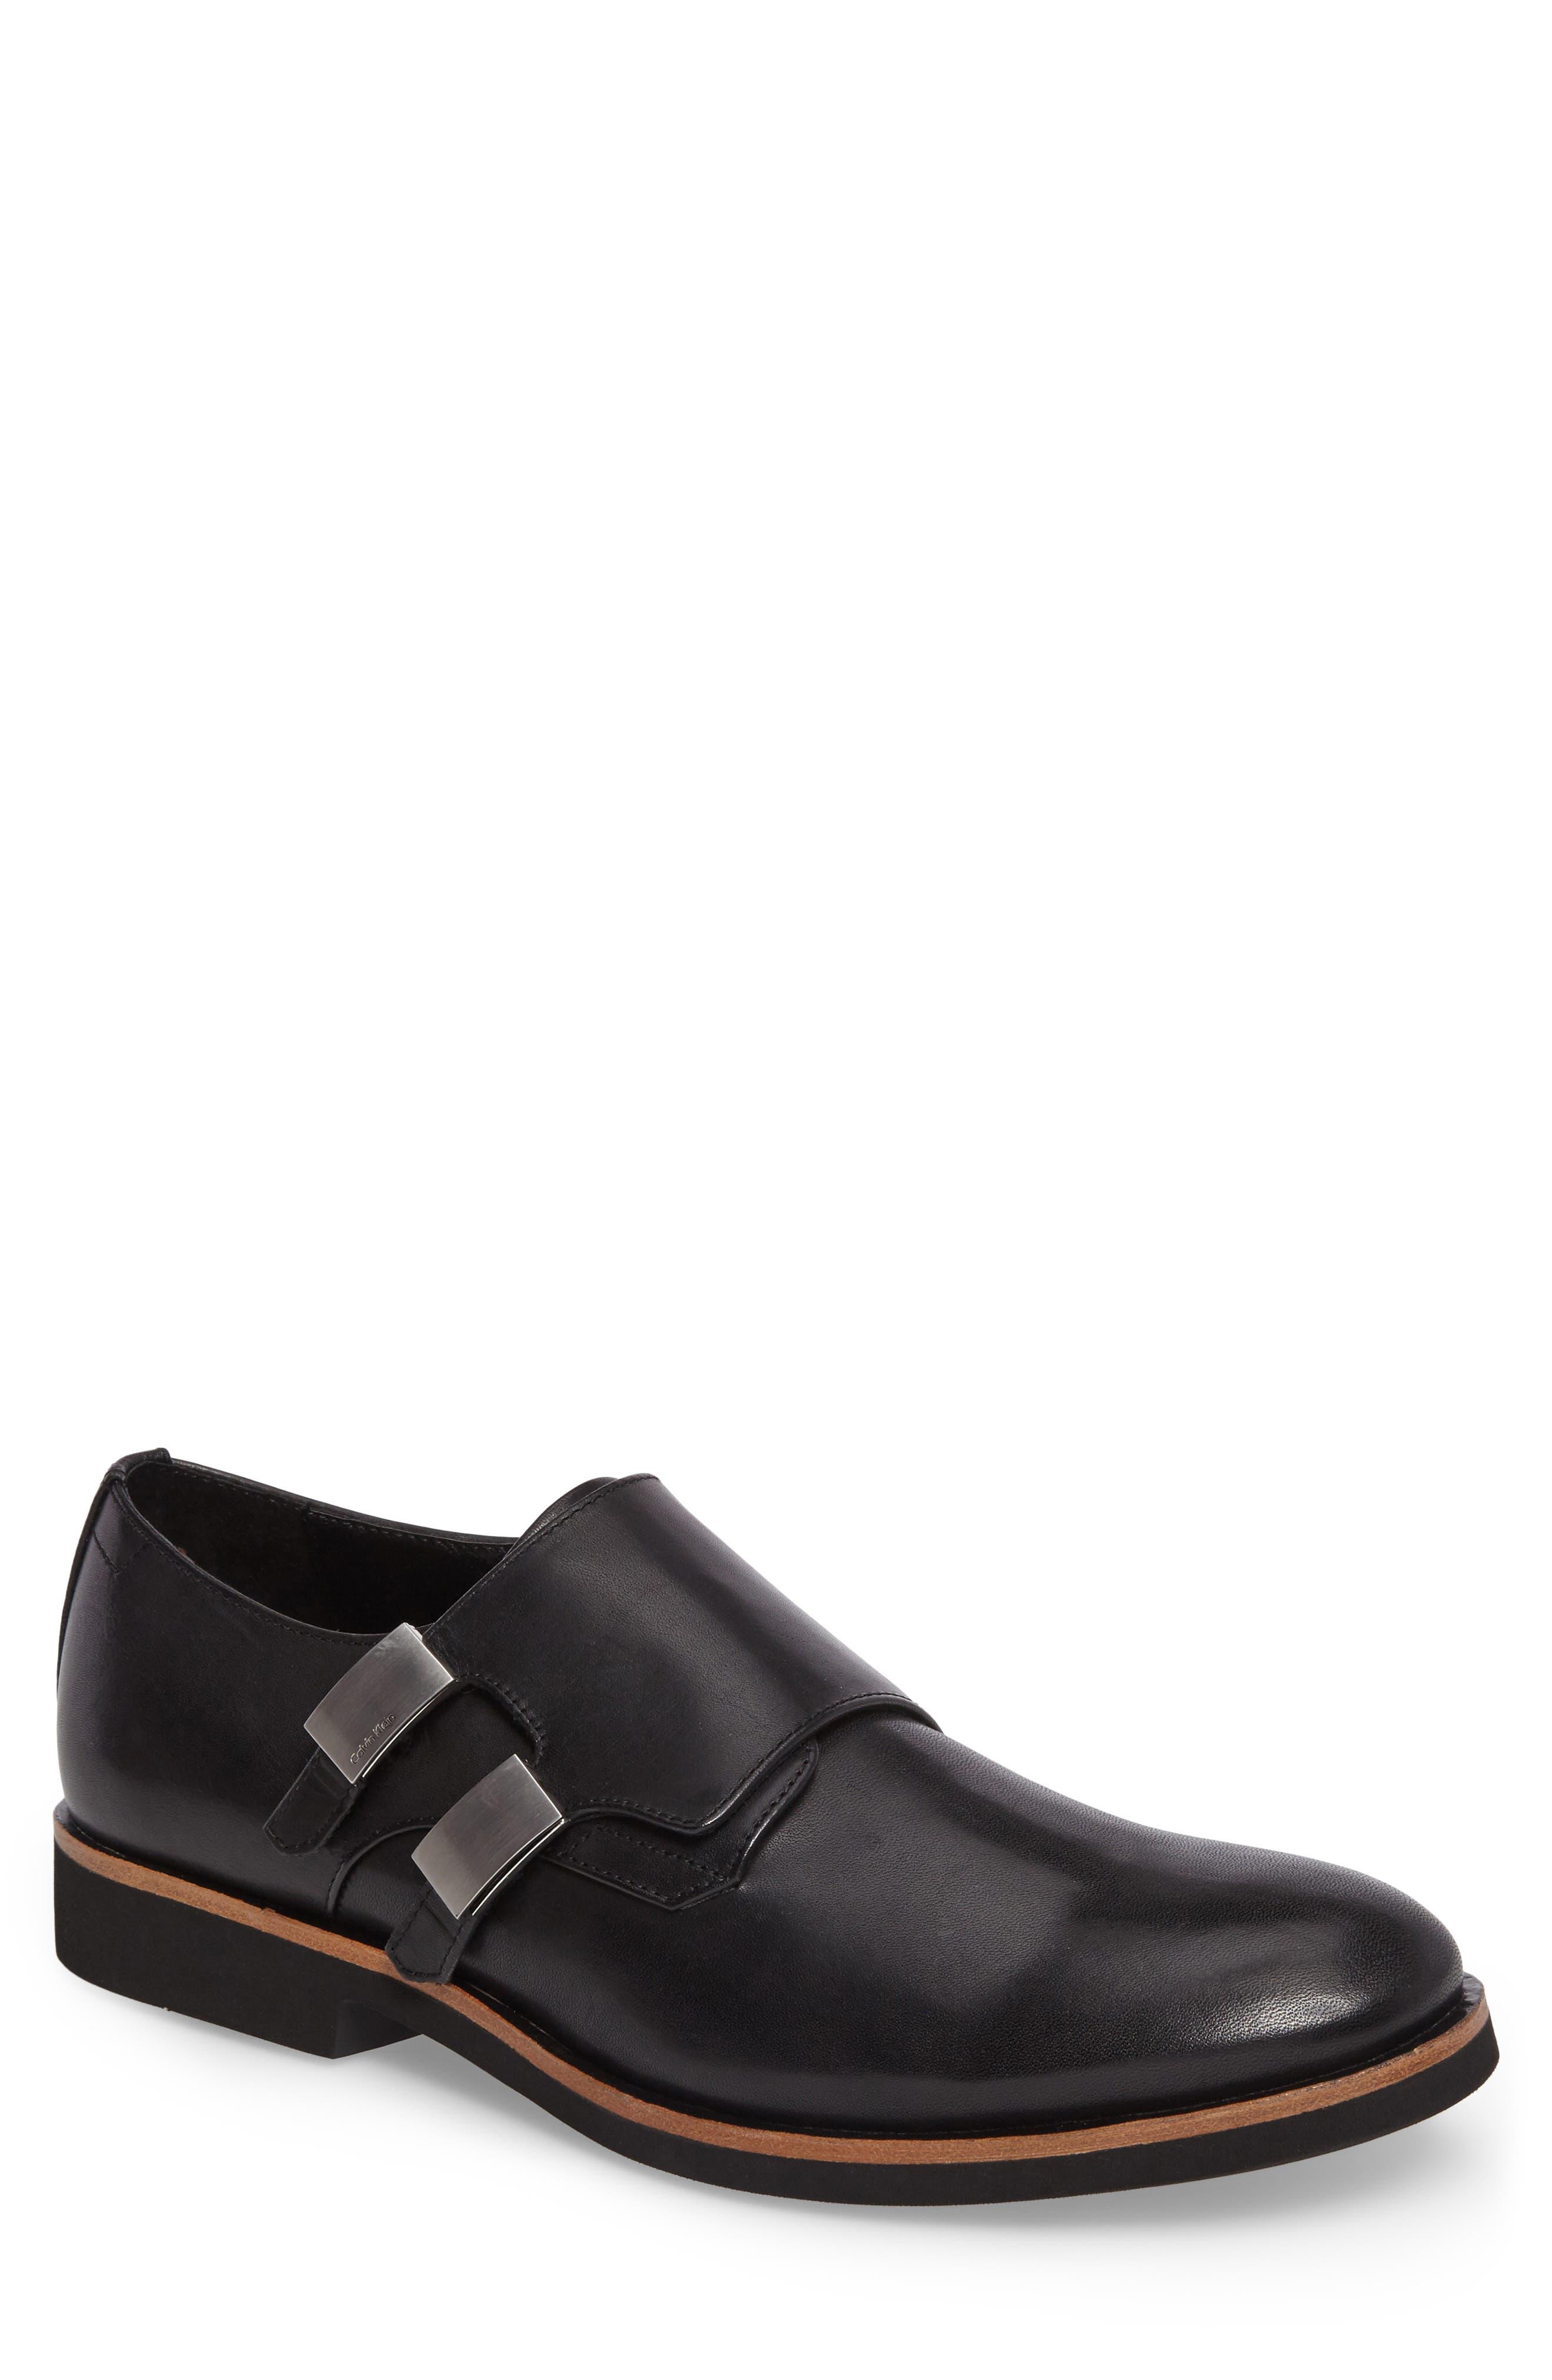 Finnegan Double Monk Strap Shoe,                         Main,                         color, Black Leather